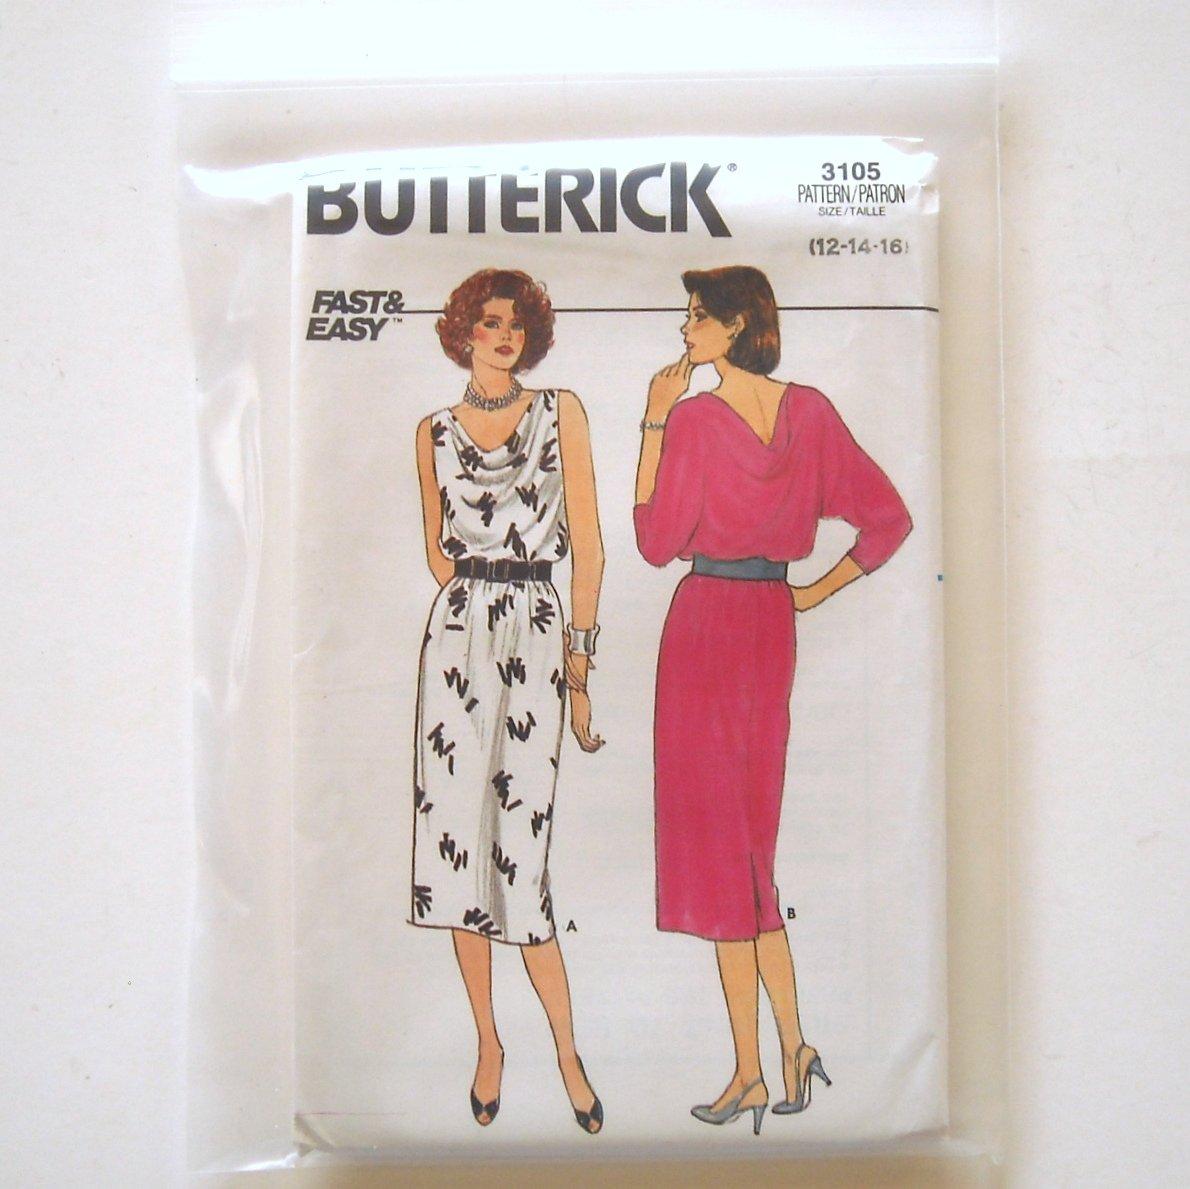 Misses Dress Size 12 - 16 Vintage Butterick Sewing Pattern 3105